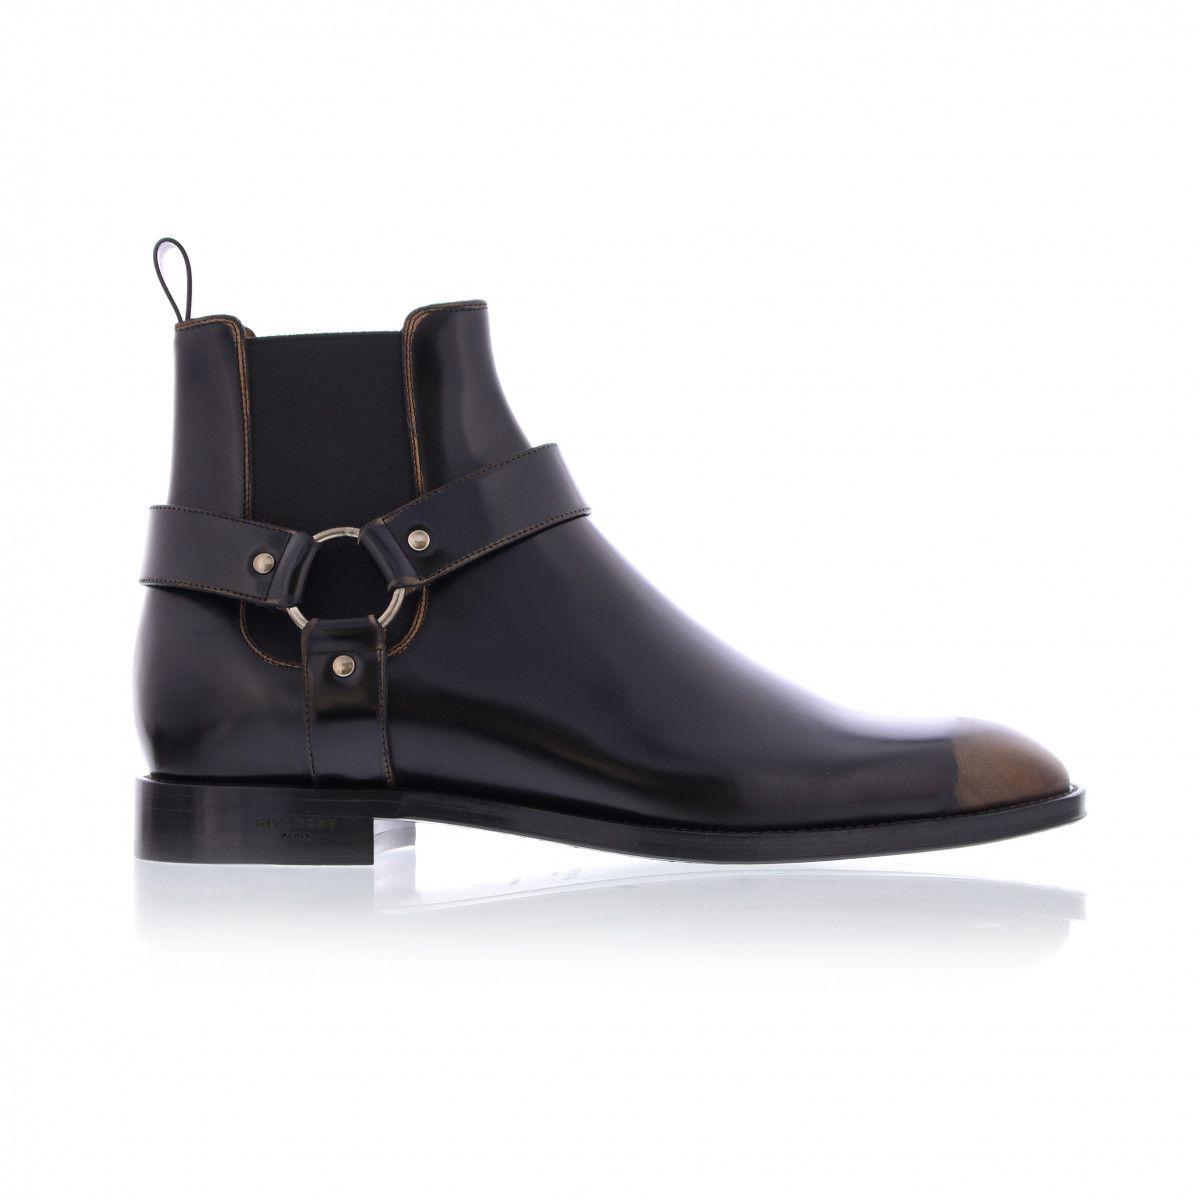 Givenchy Black Bandana Buckle Boots Gl1KZ